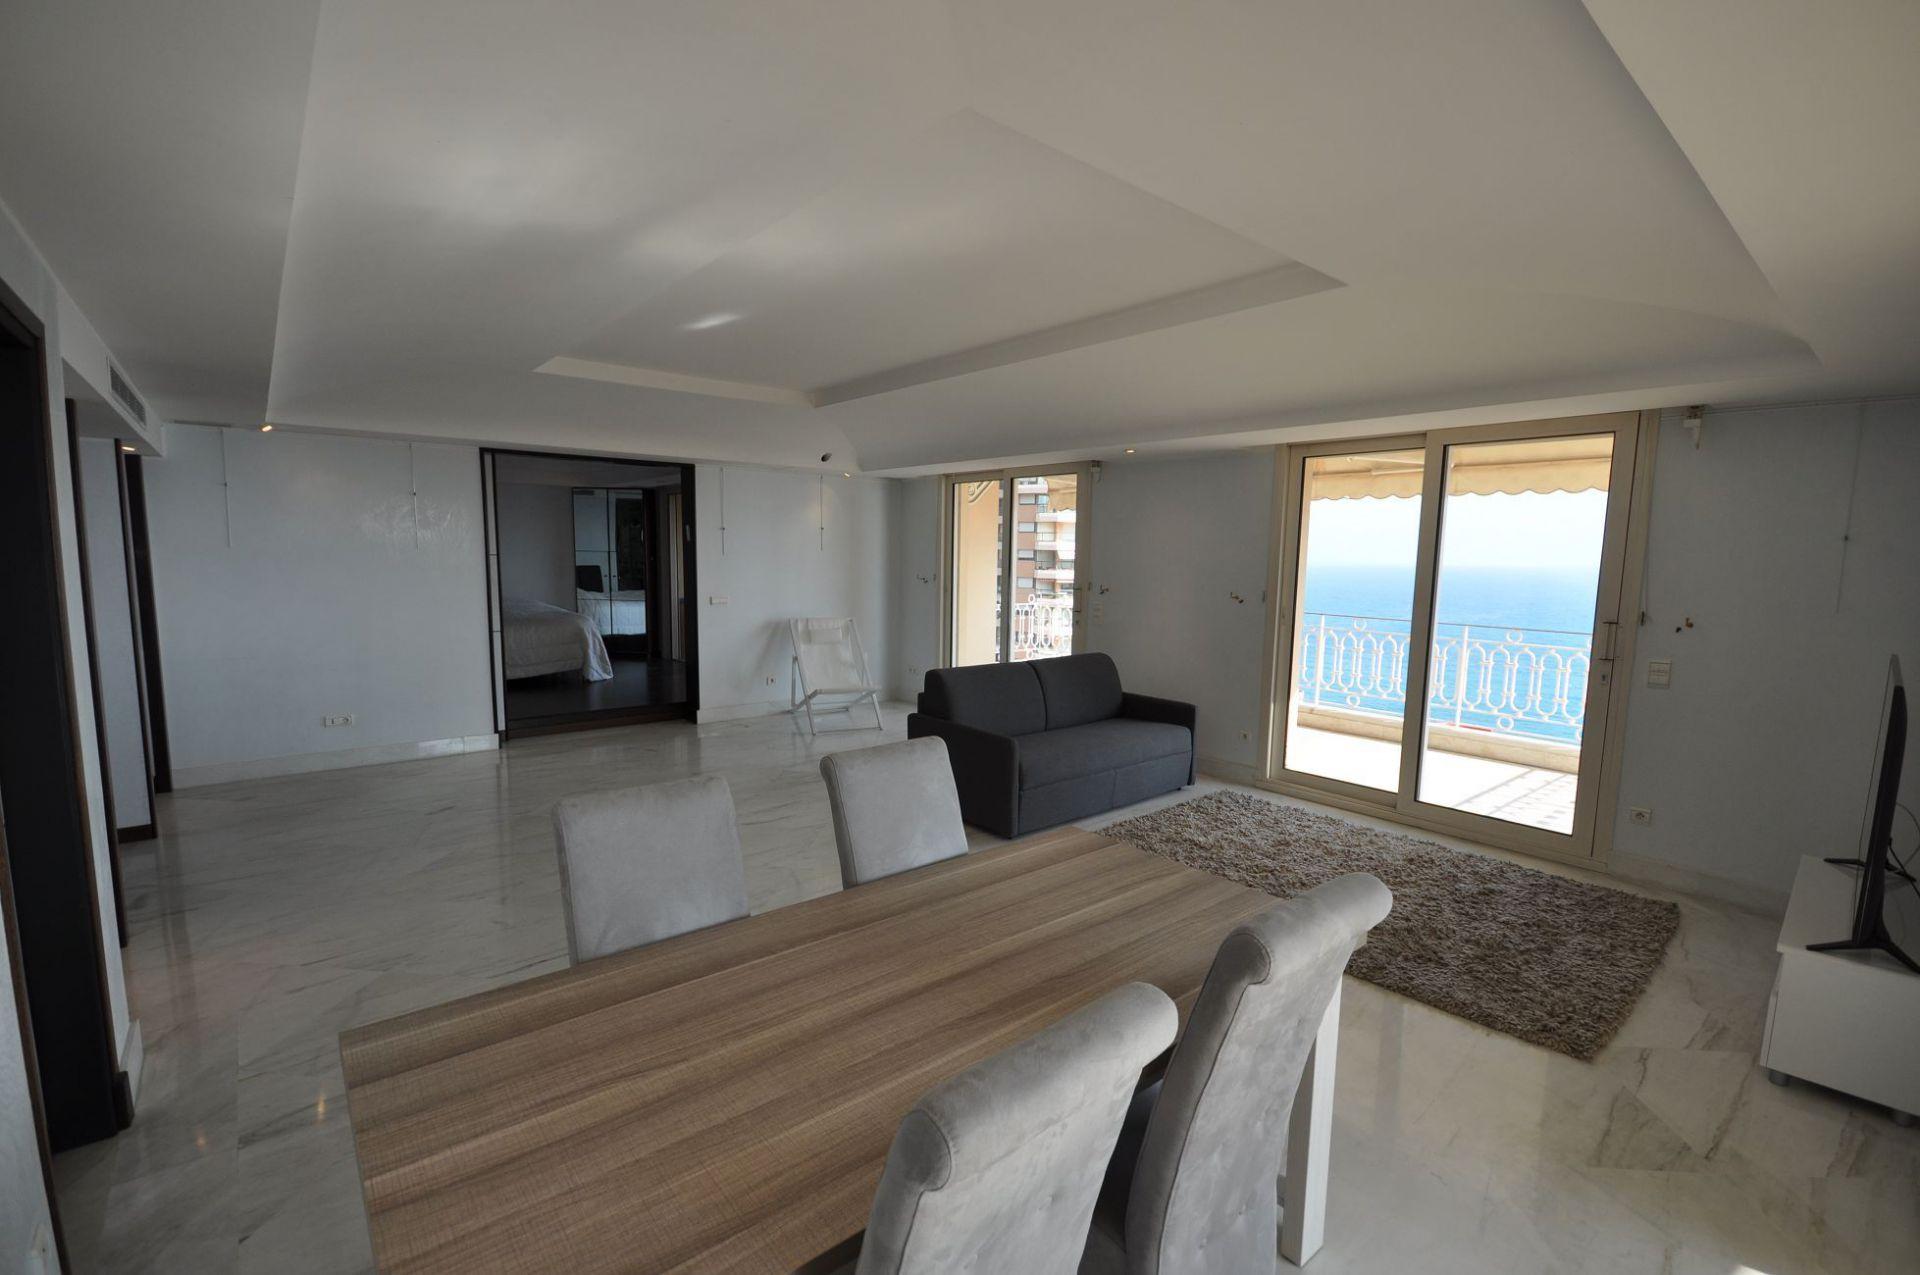 Luxury 4 rooms Apartment in Monaco, Saint Roman | Finest International | FINEST RESIDENCES